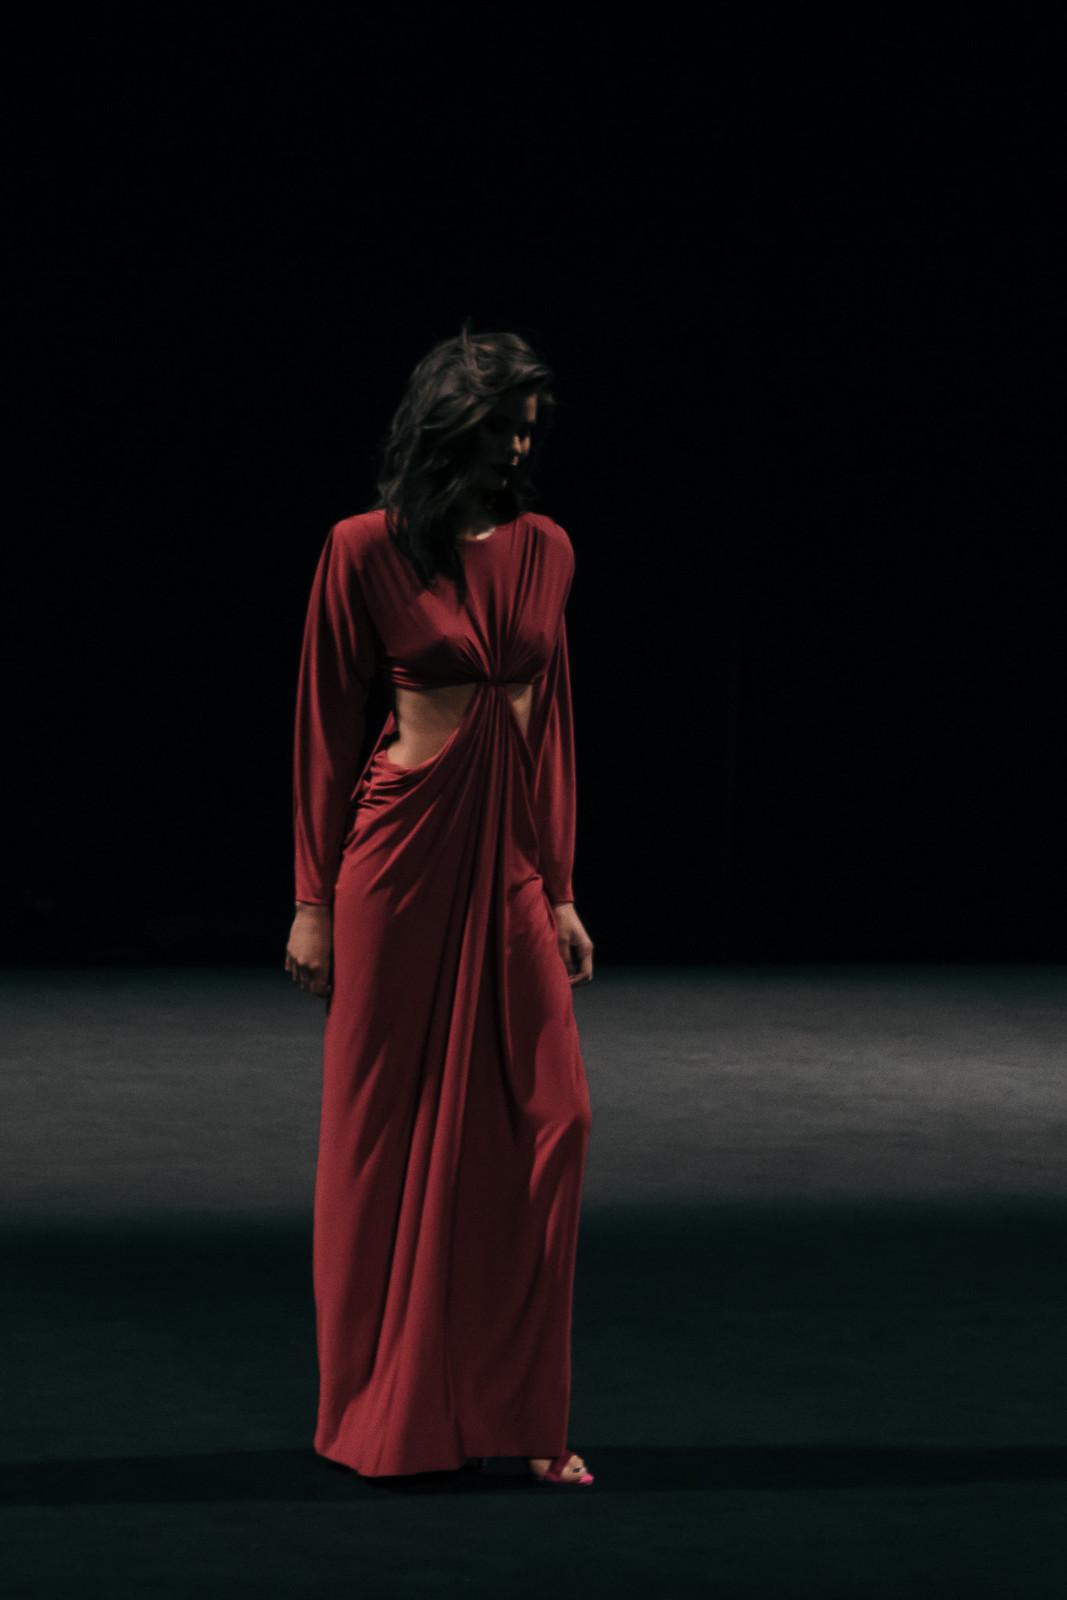 Jessie Chanes - Seams for a desire - 080 Bacelona Fashion #080bcnfasion -64